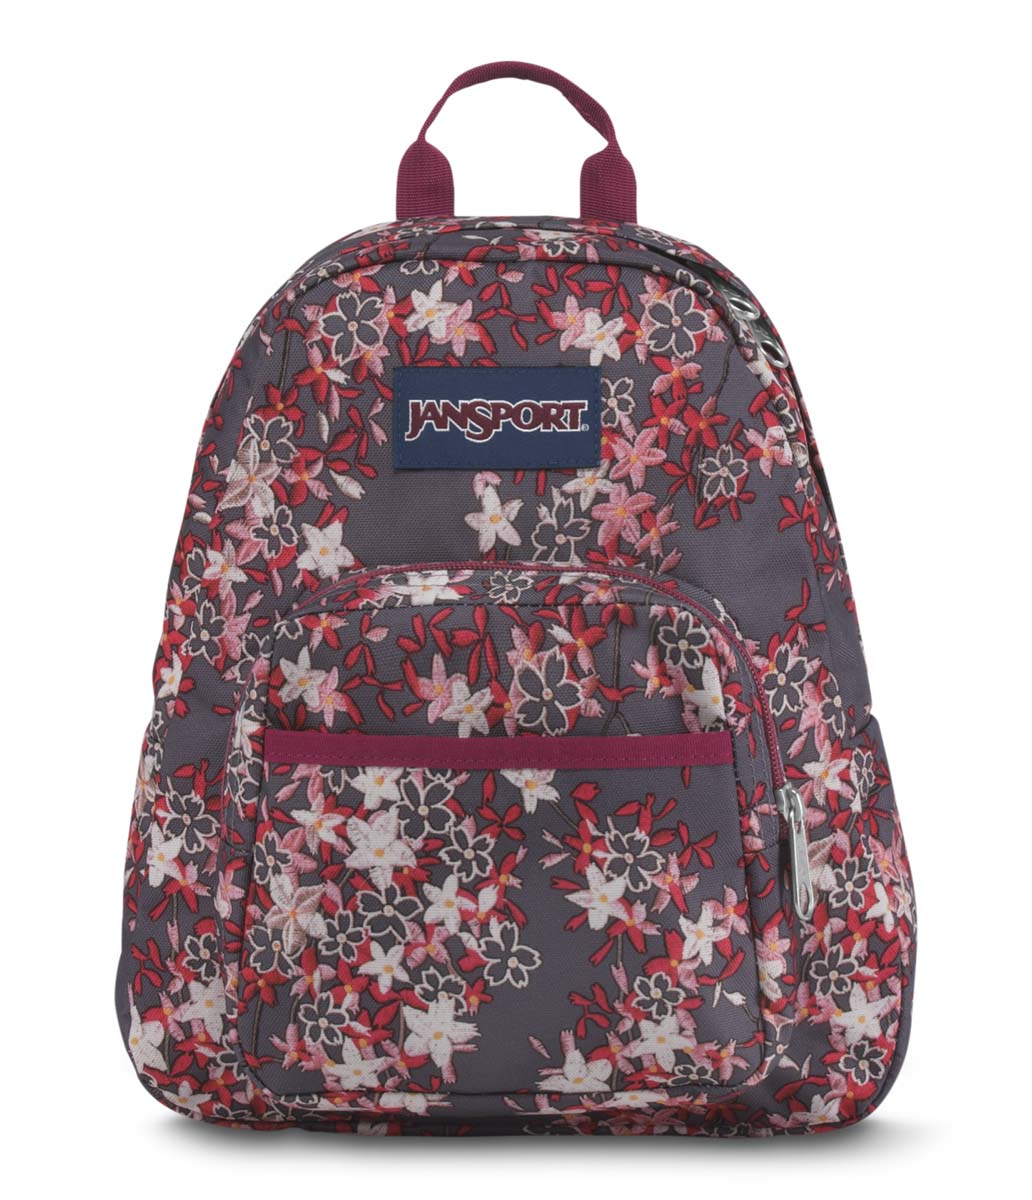 JanSport กระเป๋าเป้ รุ่น Half Pint - Folk Floral